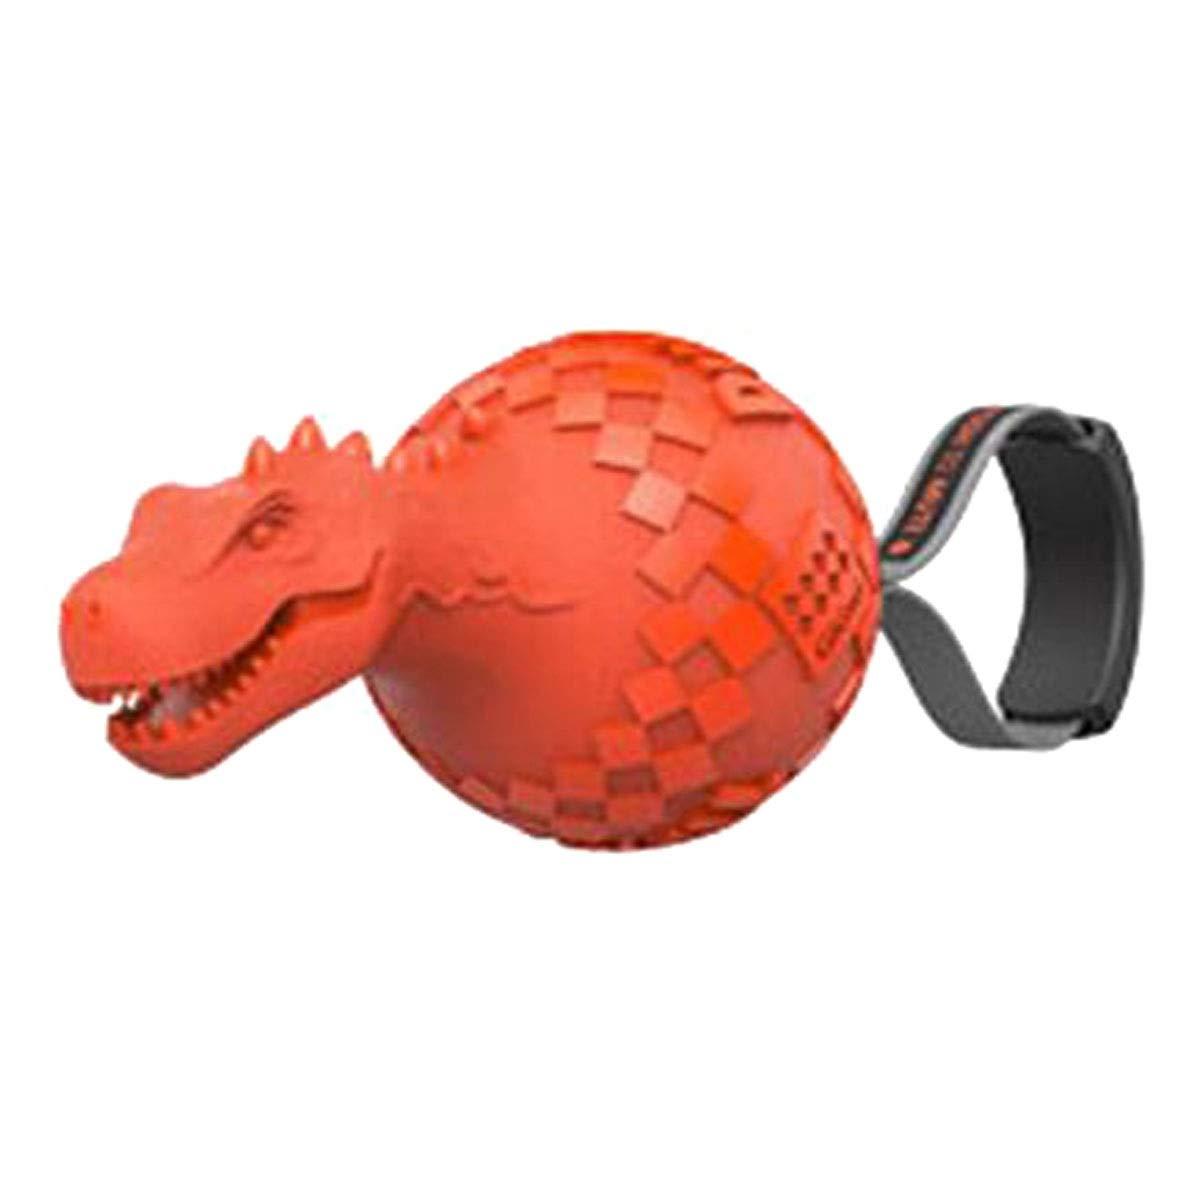 orange Hongyushanghang Dog Toy, Big Dog Rubber Chew Toy, Dog Stretch Tyrannosaurus Vocal Toy, Purple, bluee, orange, Green, (15.3  8  8.1cm) fine (color   orange)